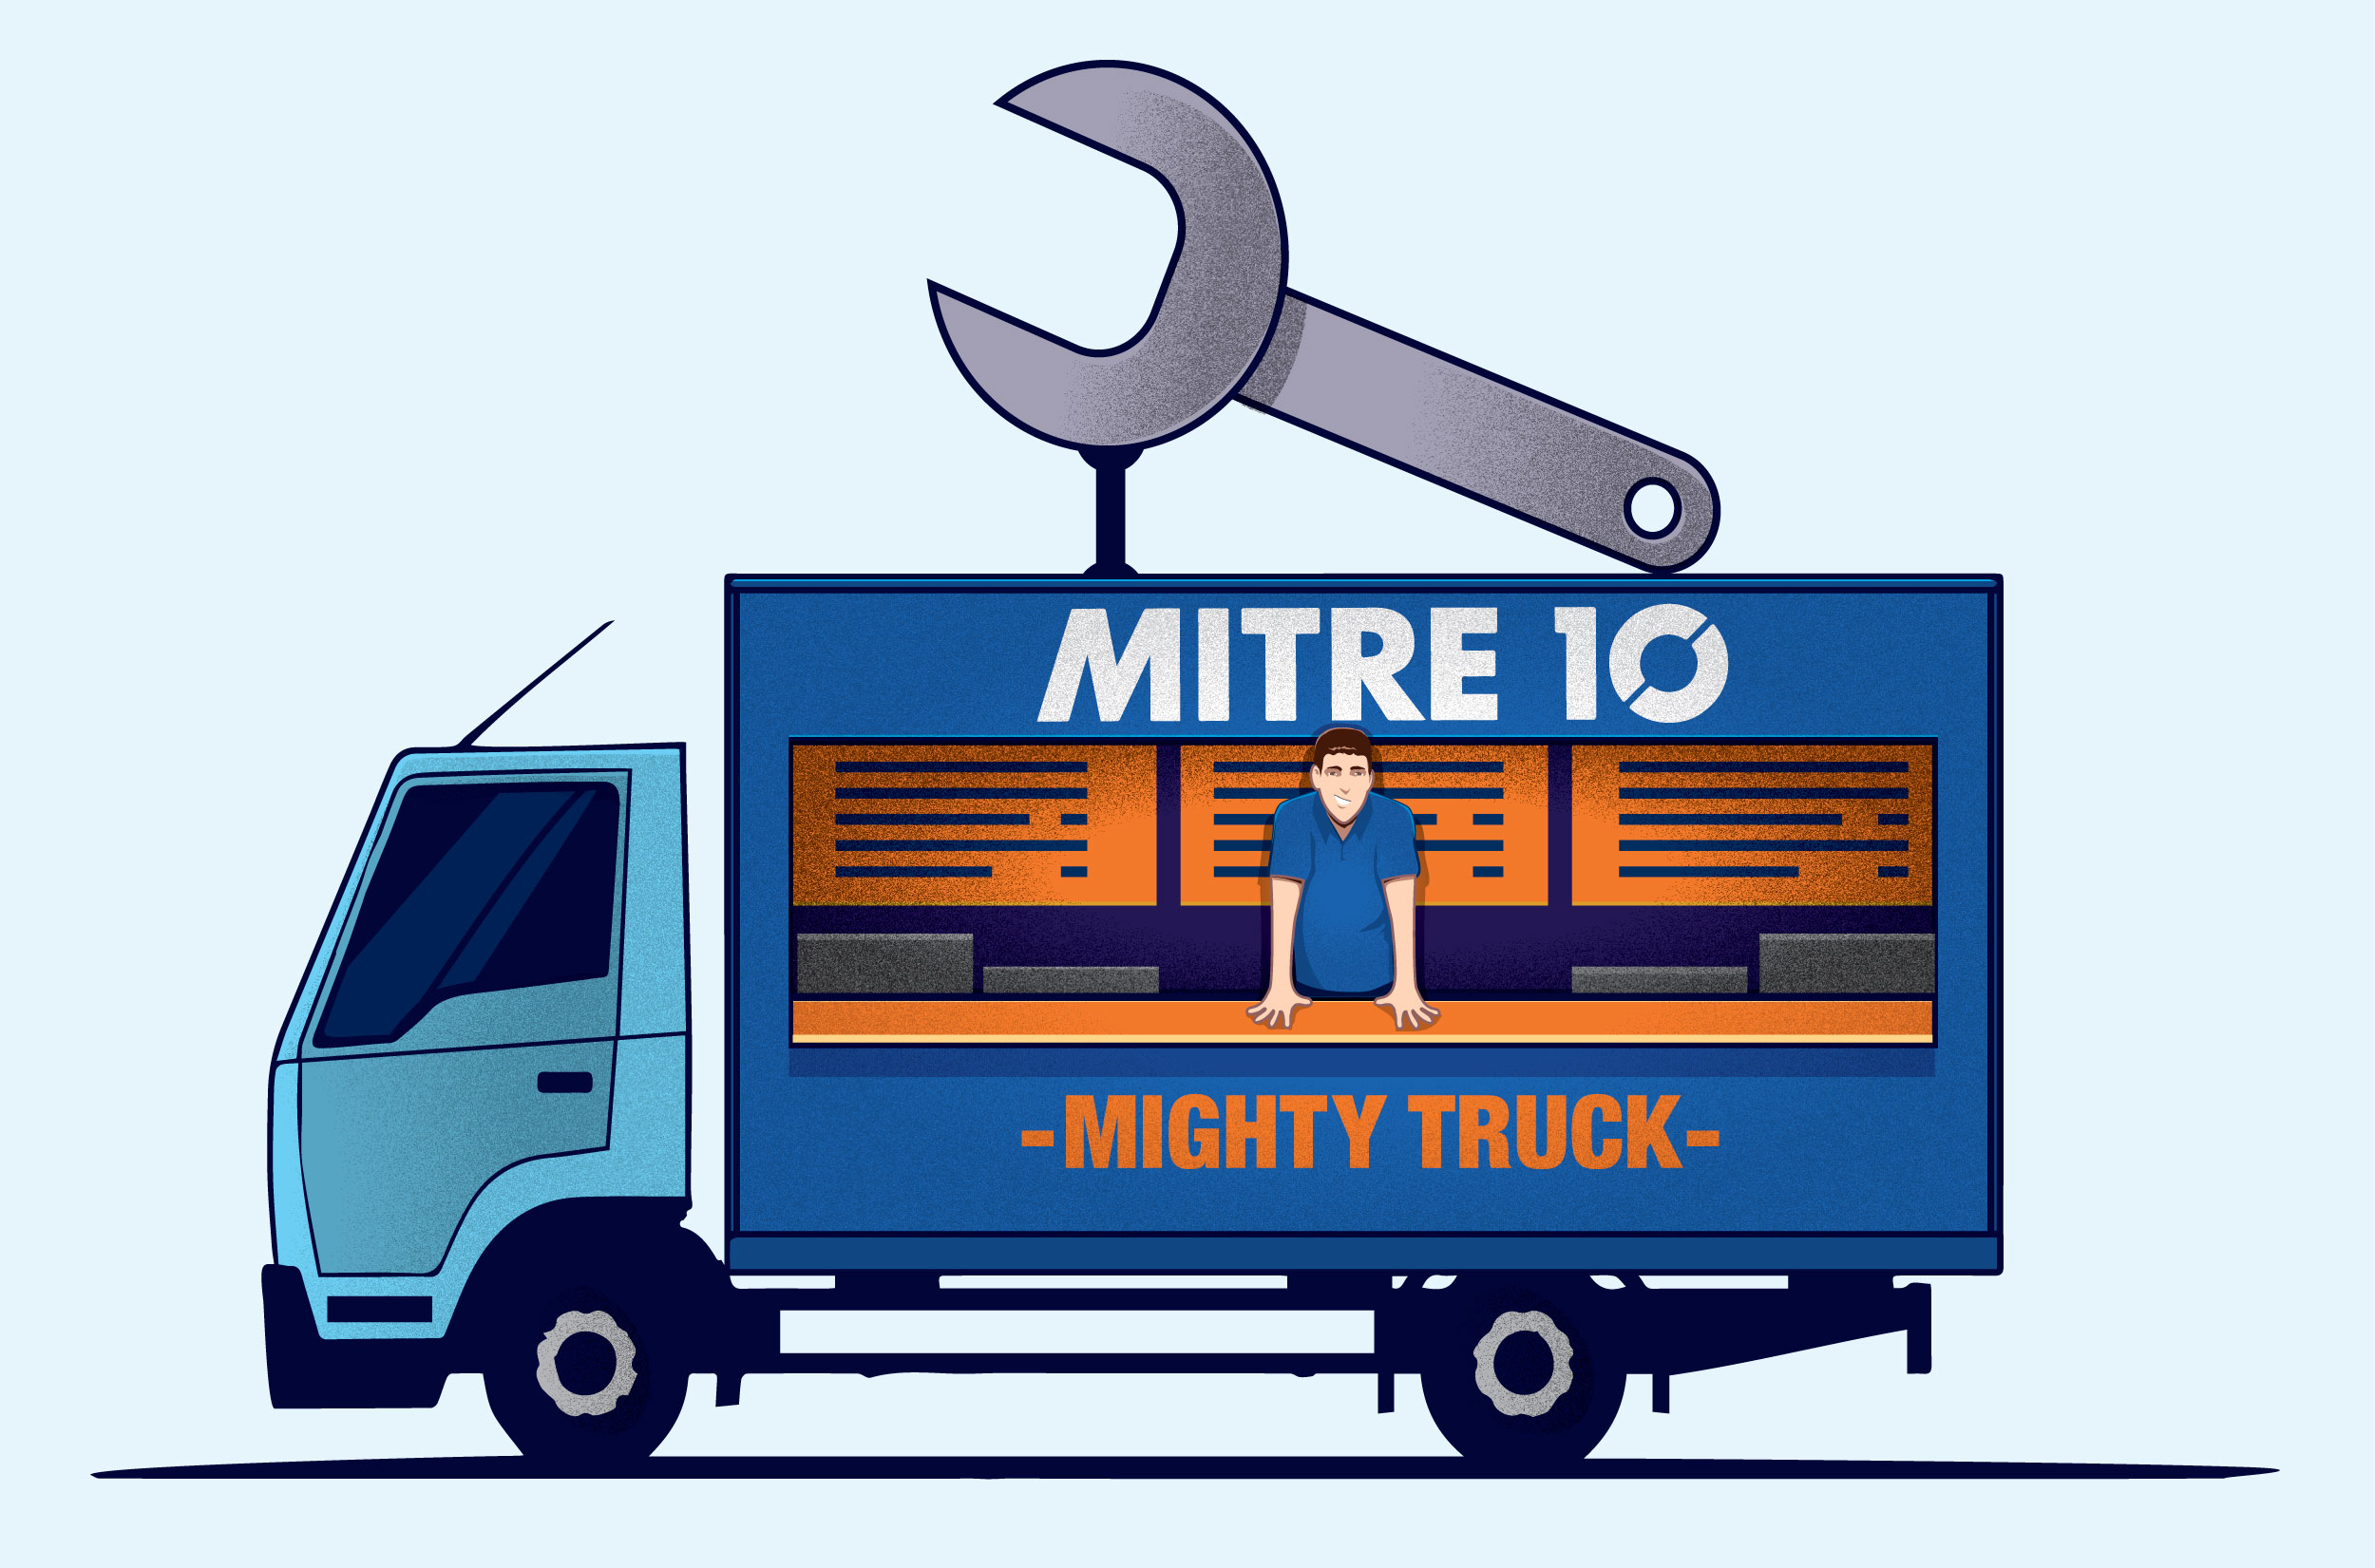 mitre-10-truck-ice-cream-1-1.jpg